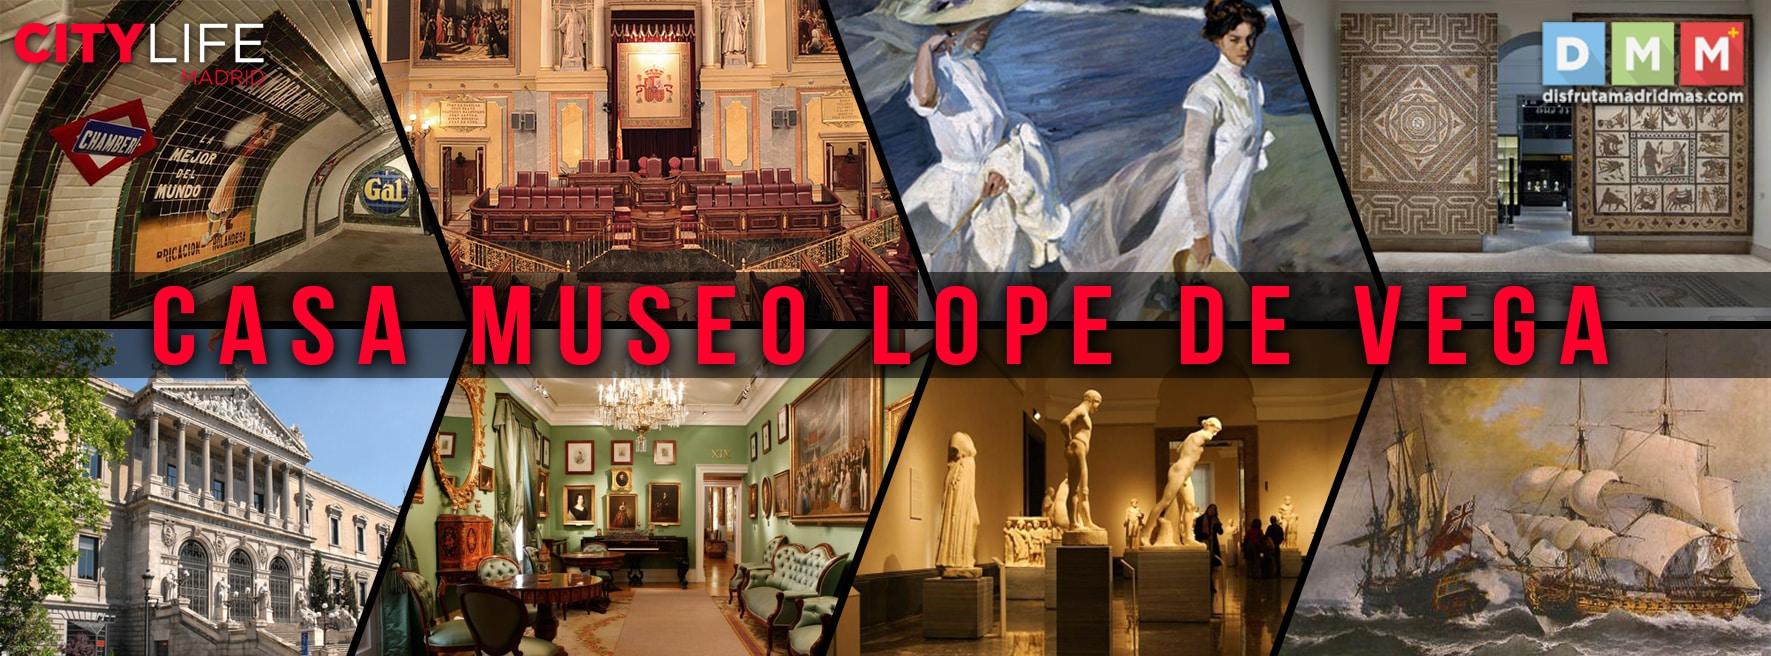 FREE TOUR: CASA MUSEO LOPE DE VEGA!